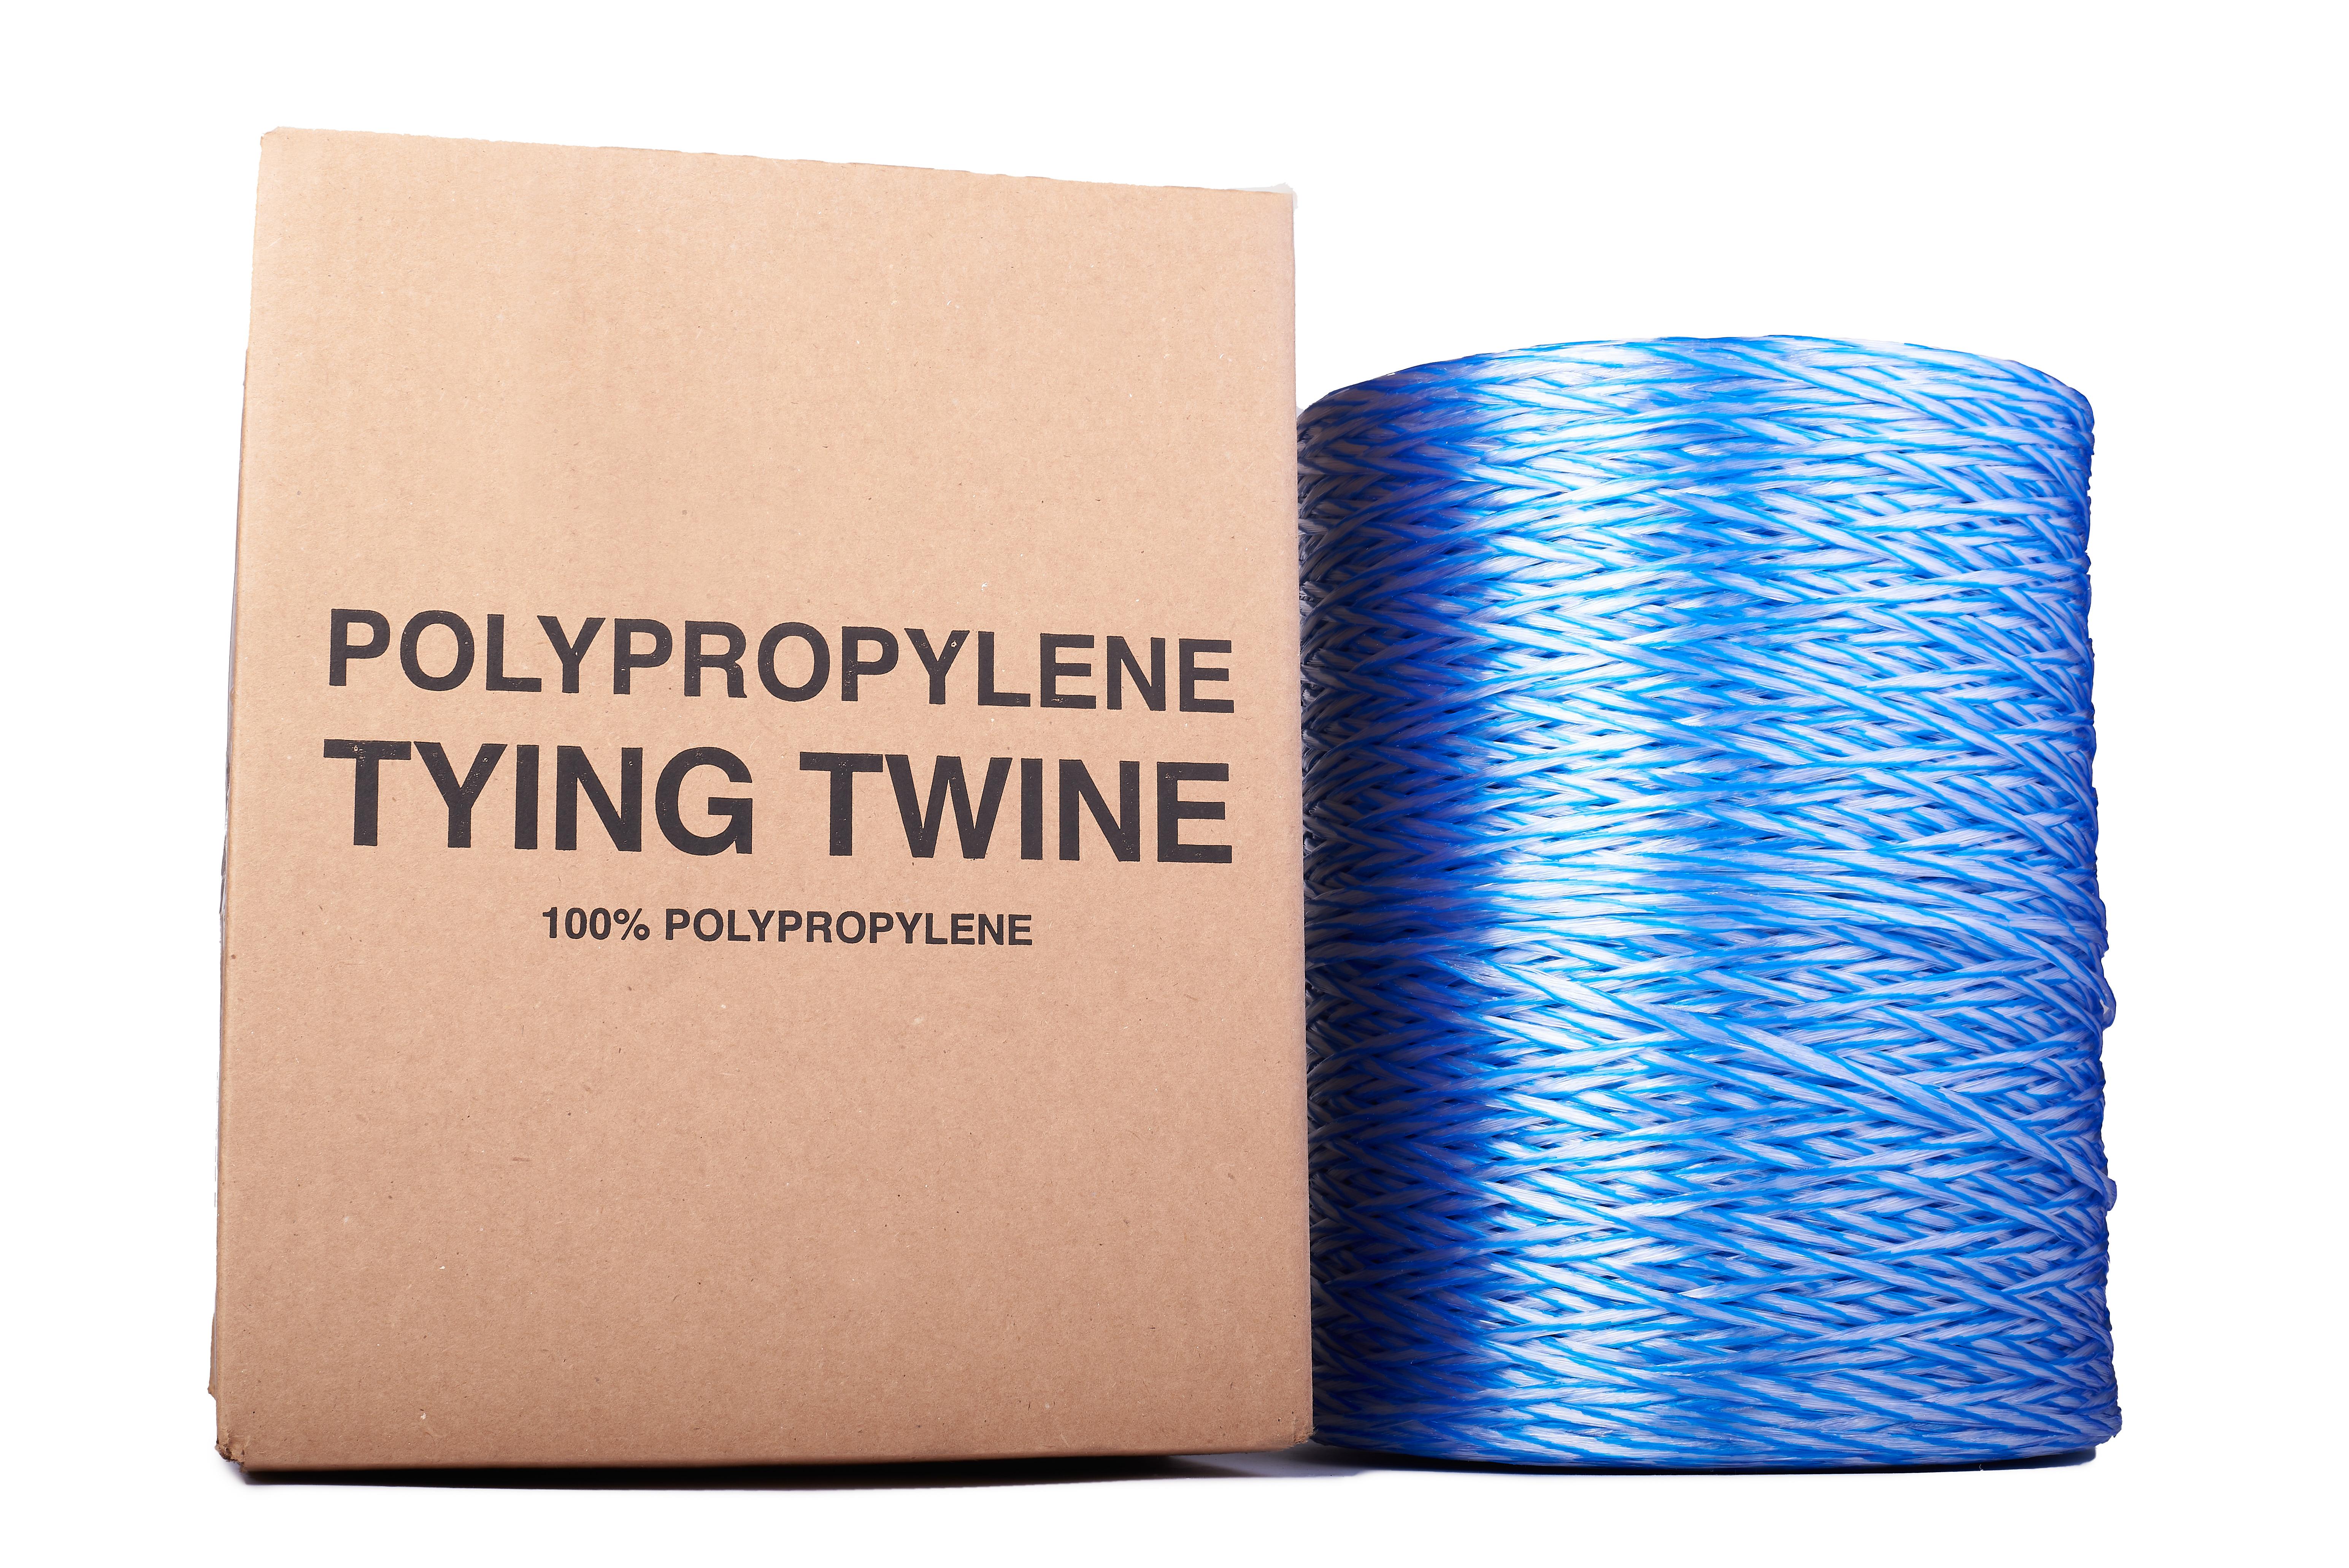 Orion-Cordage-Radiant Film Tying Twine-Blue-Straight276.jpg